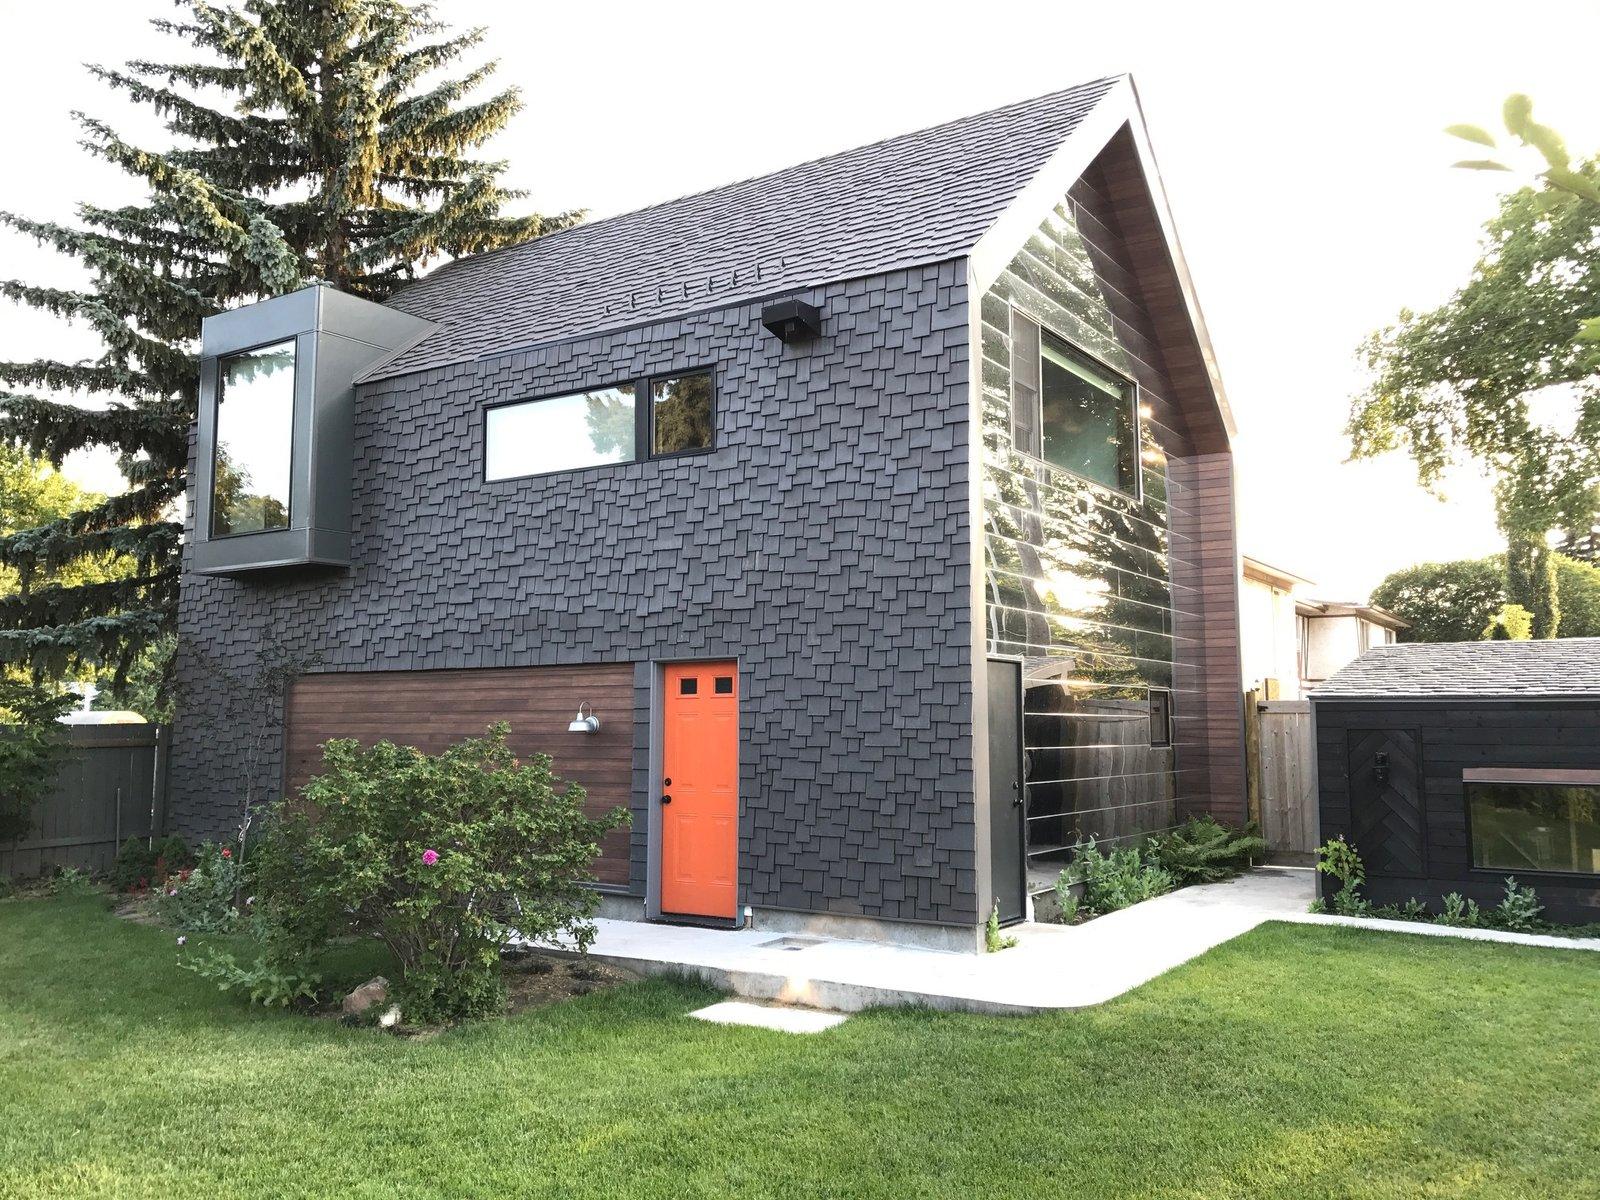 Calder laneway house edmonton modern home in edmonton for New modern homes edmonton